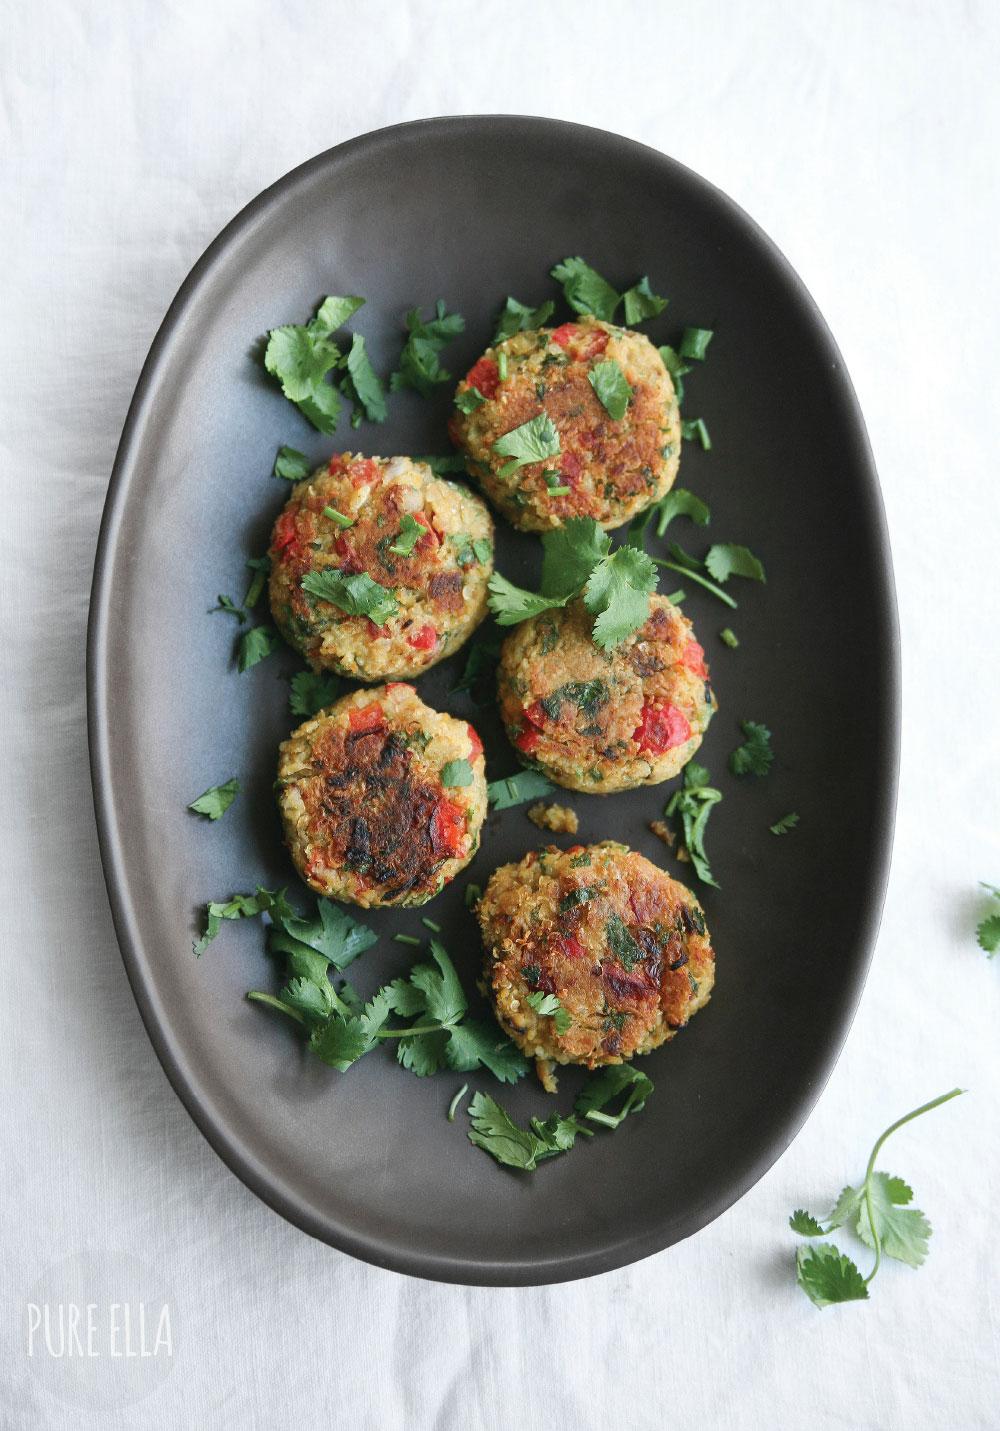 Pure-Ella-Quinoa-Chickpea-Burgers-vegan-gluten-free3